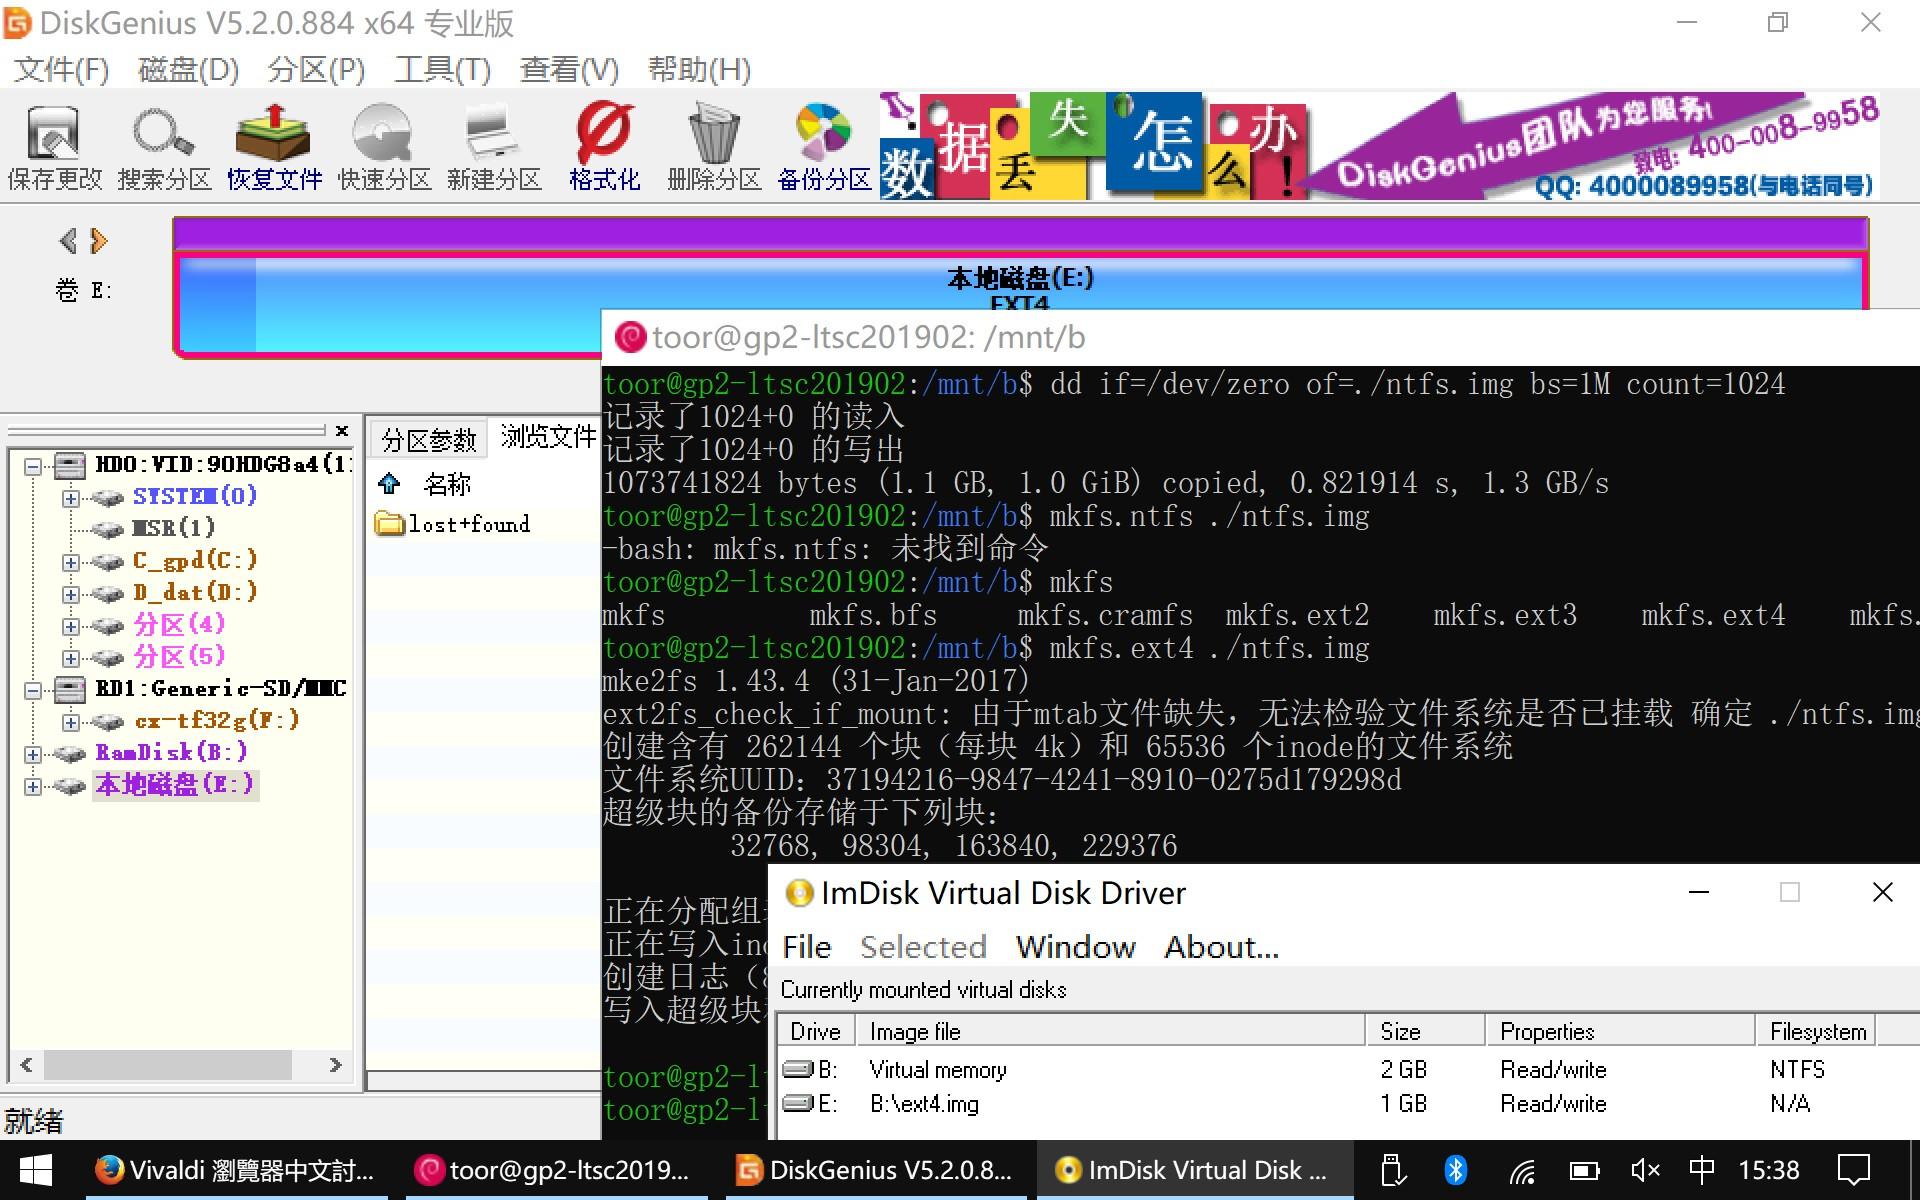 imdisk20210125-002.jpeg